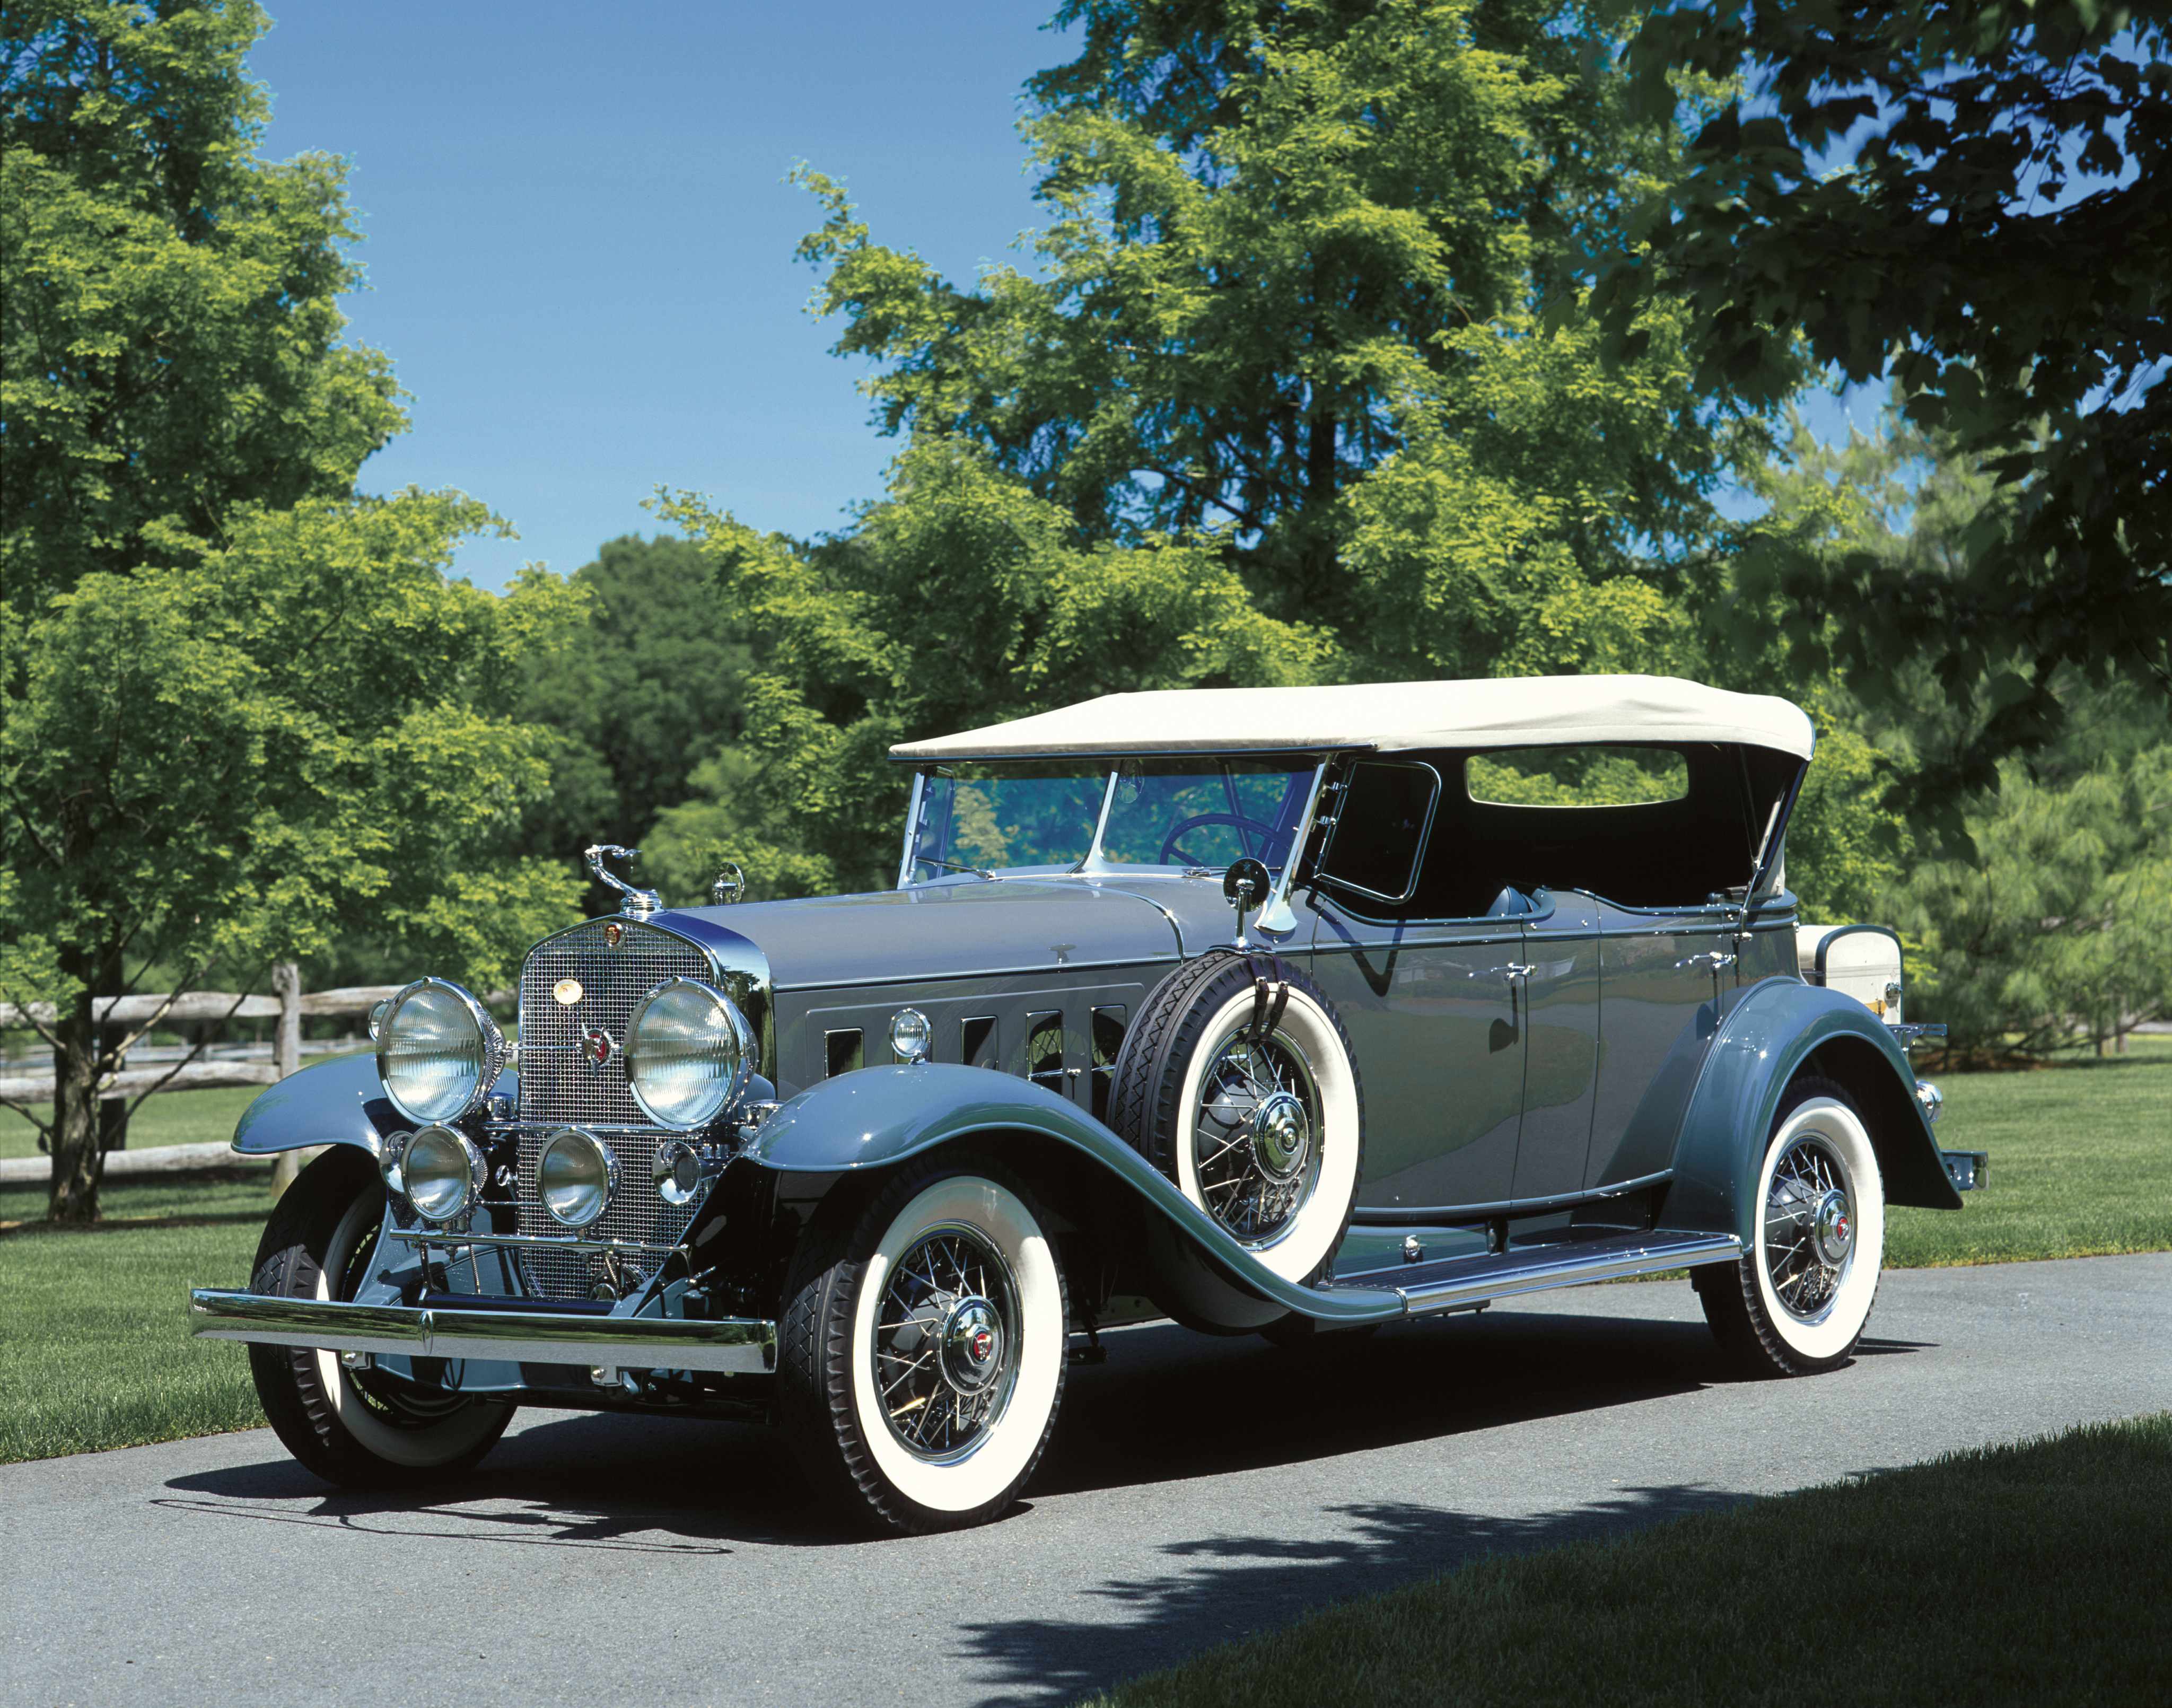 Images of 1930 Cadillac Model 452 V16 | 4096x3221